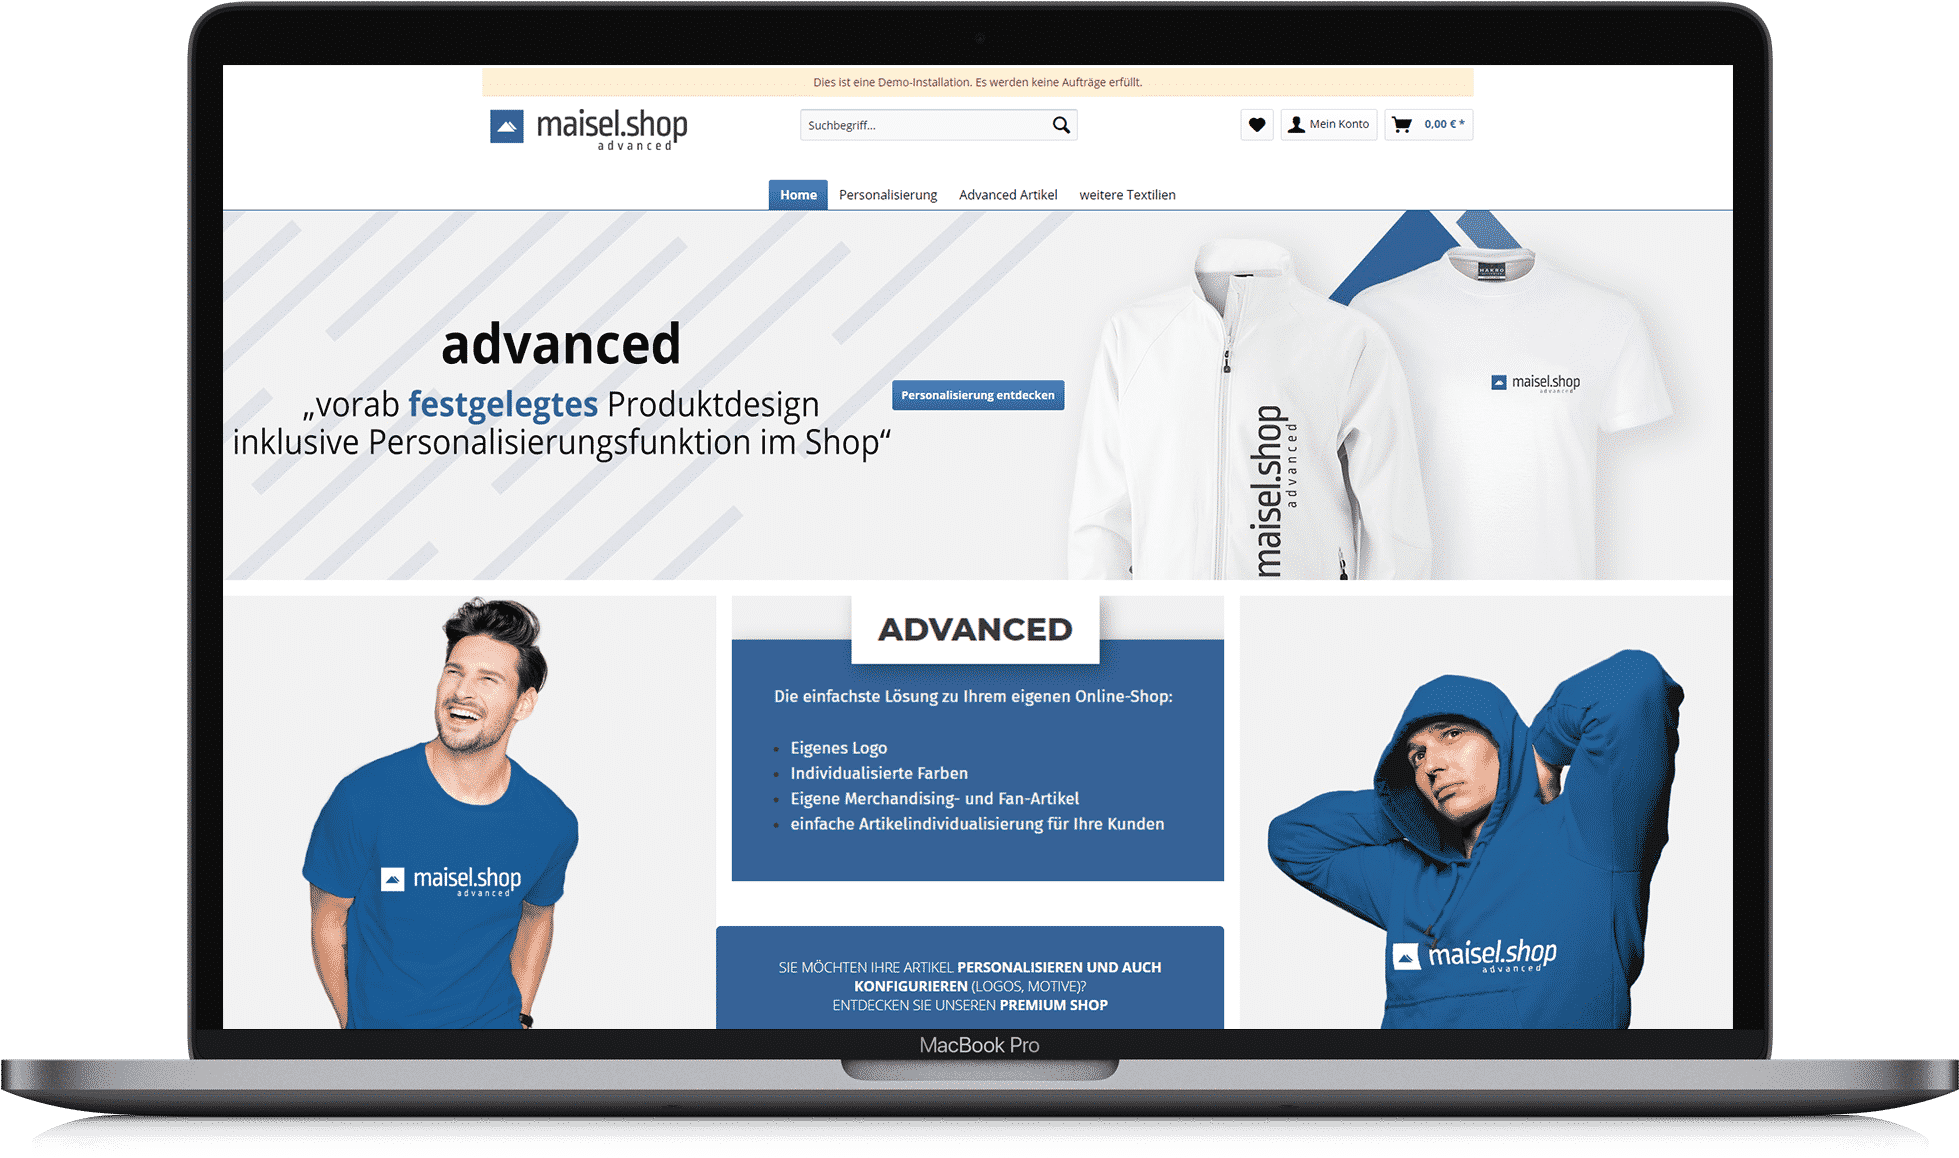 Maisel Shop Advanced